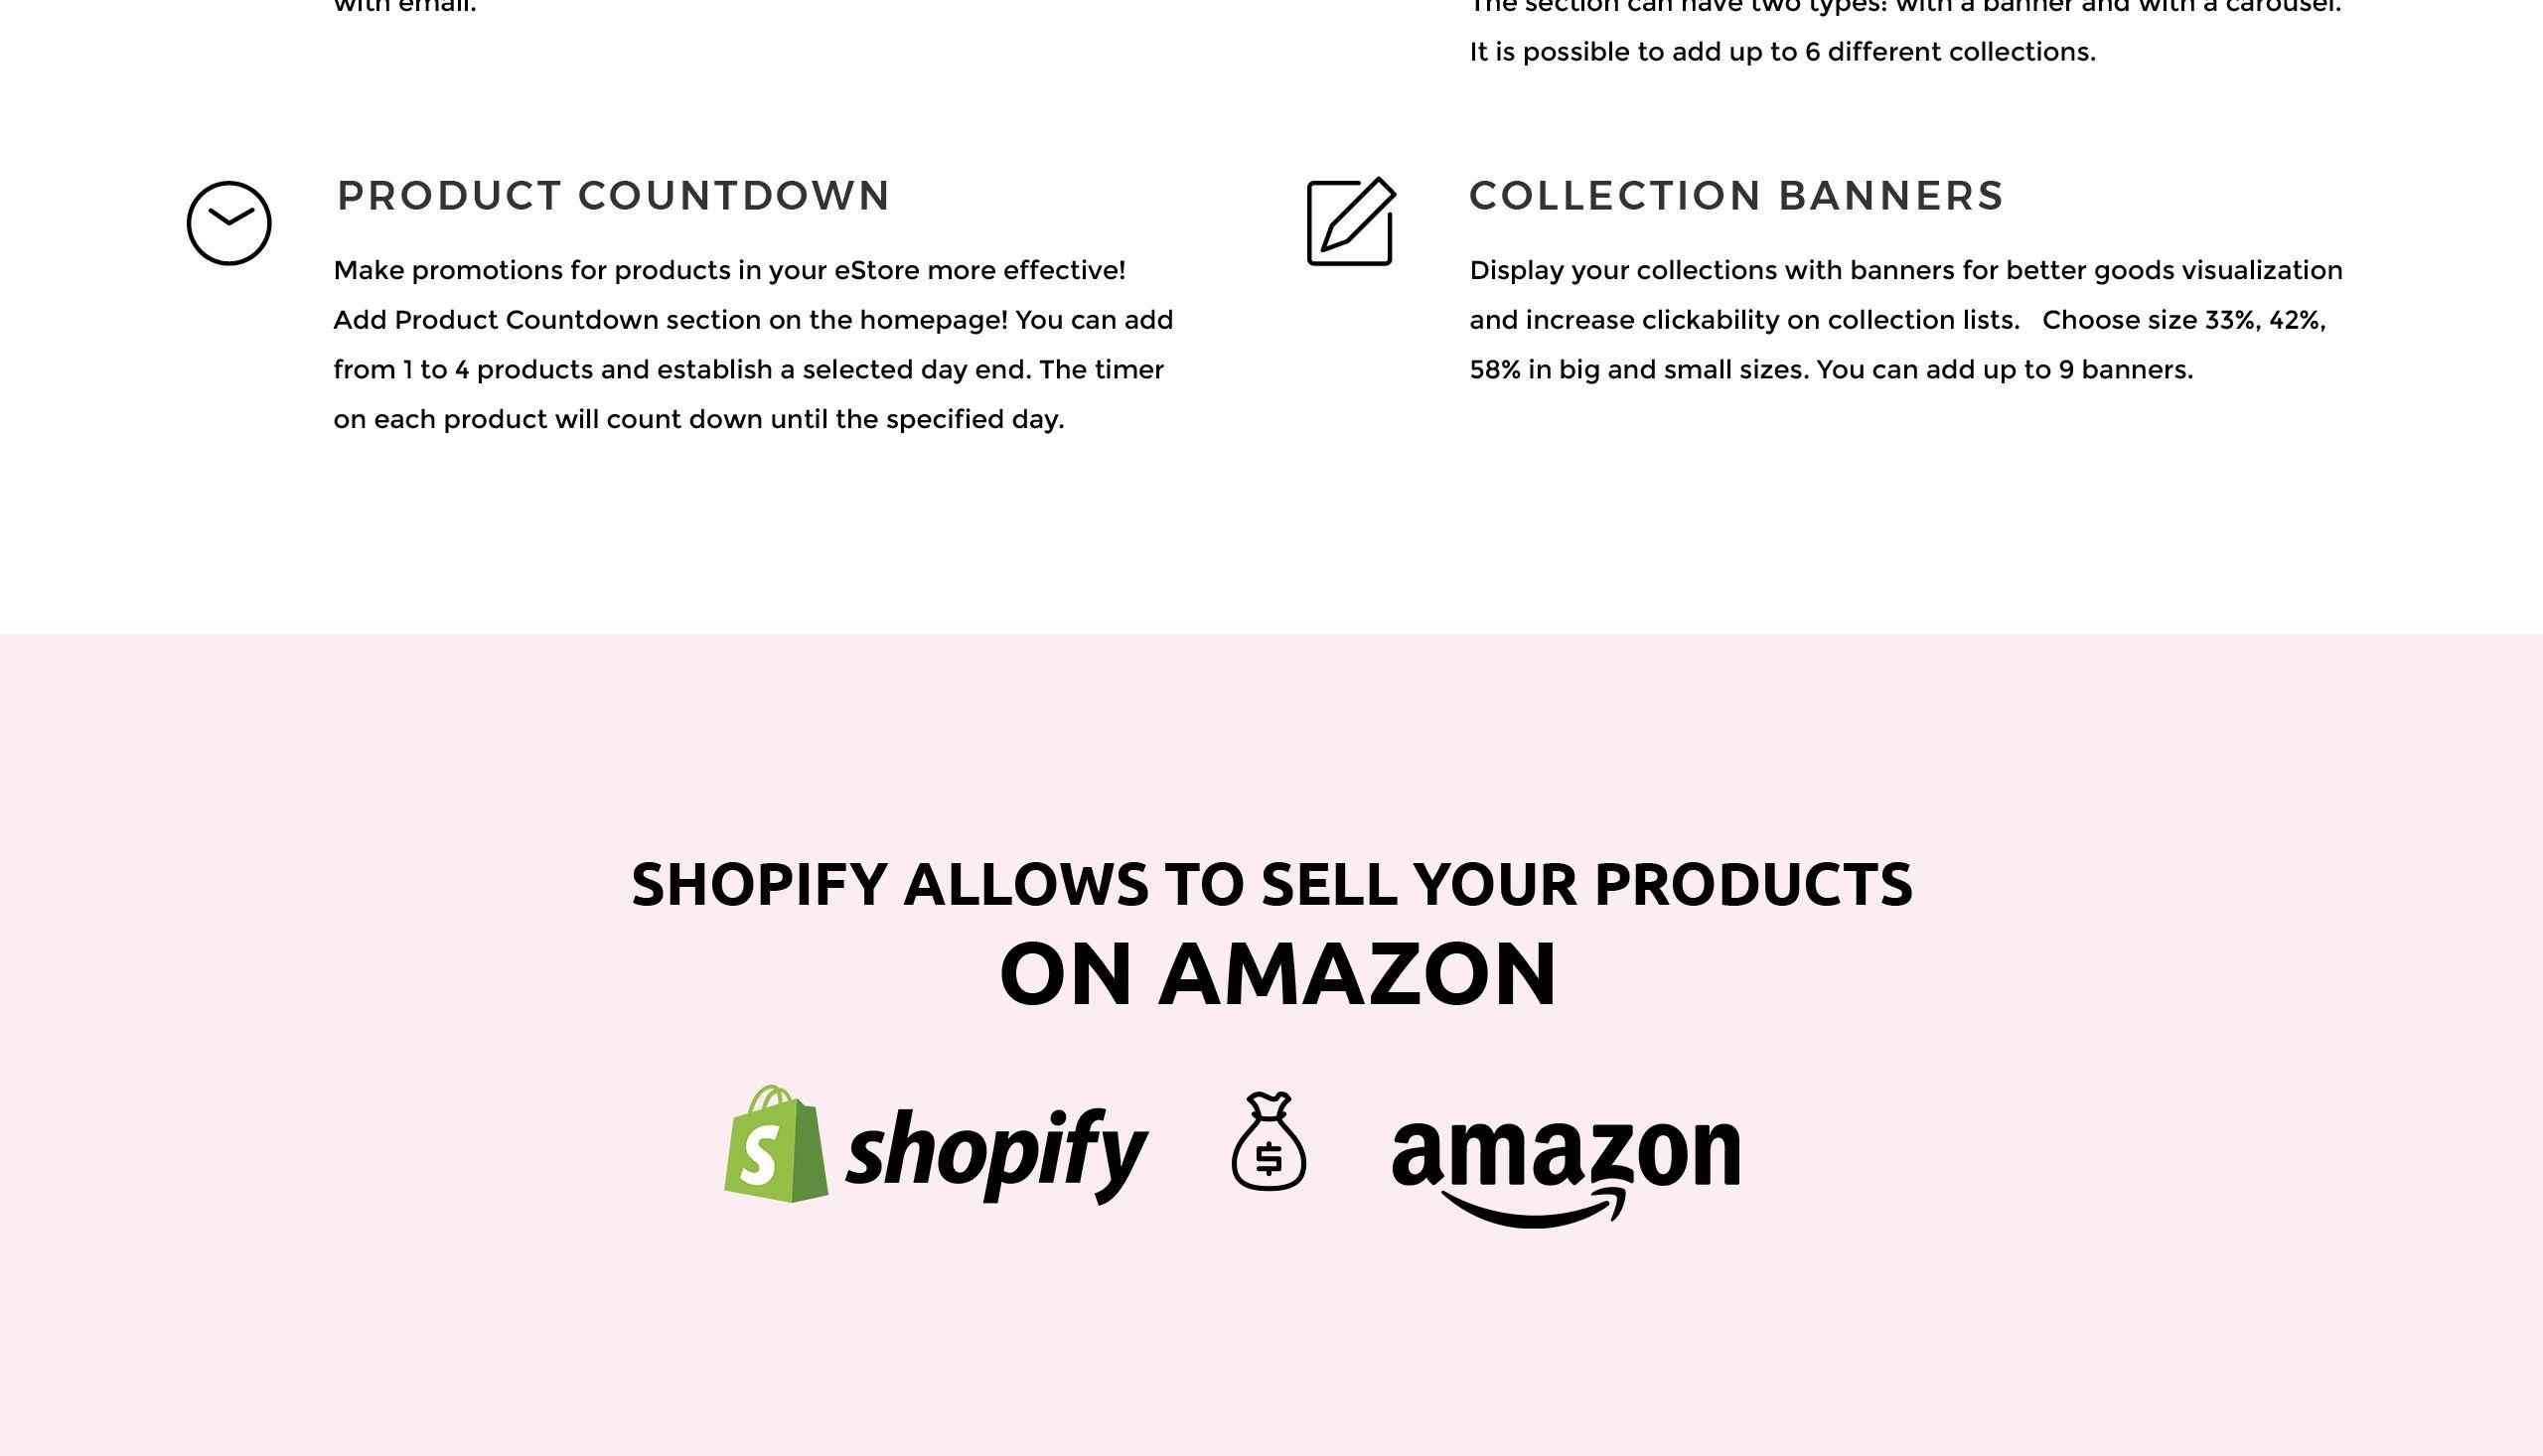 Bionika Organic Cosmetics Store Shopify Theme 74011 Ad Cosmetics Store Bionika Organic Shopify Cosmetic Store Organic Cosmetics Shopify Theme